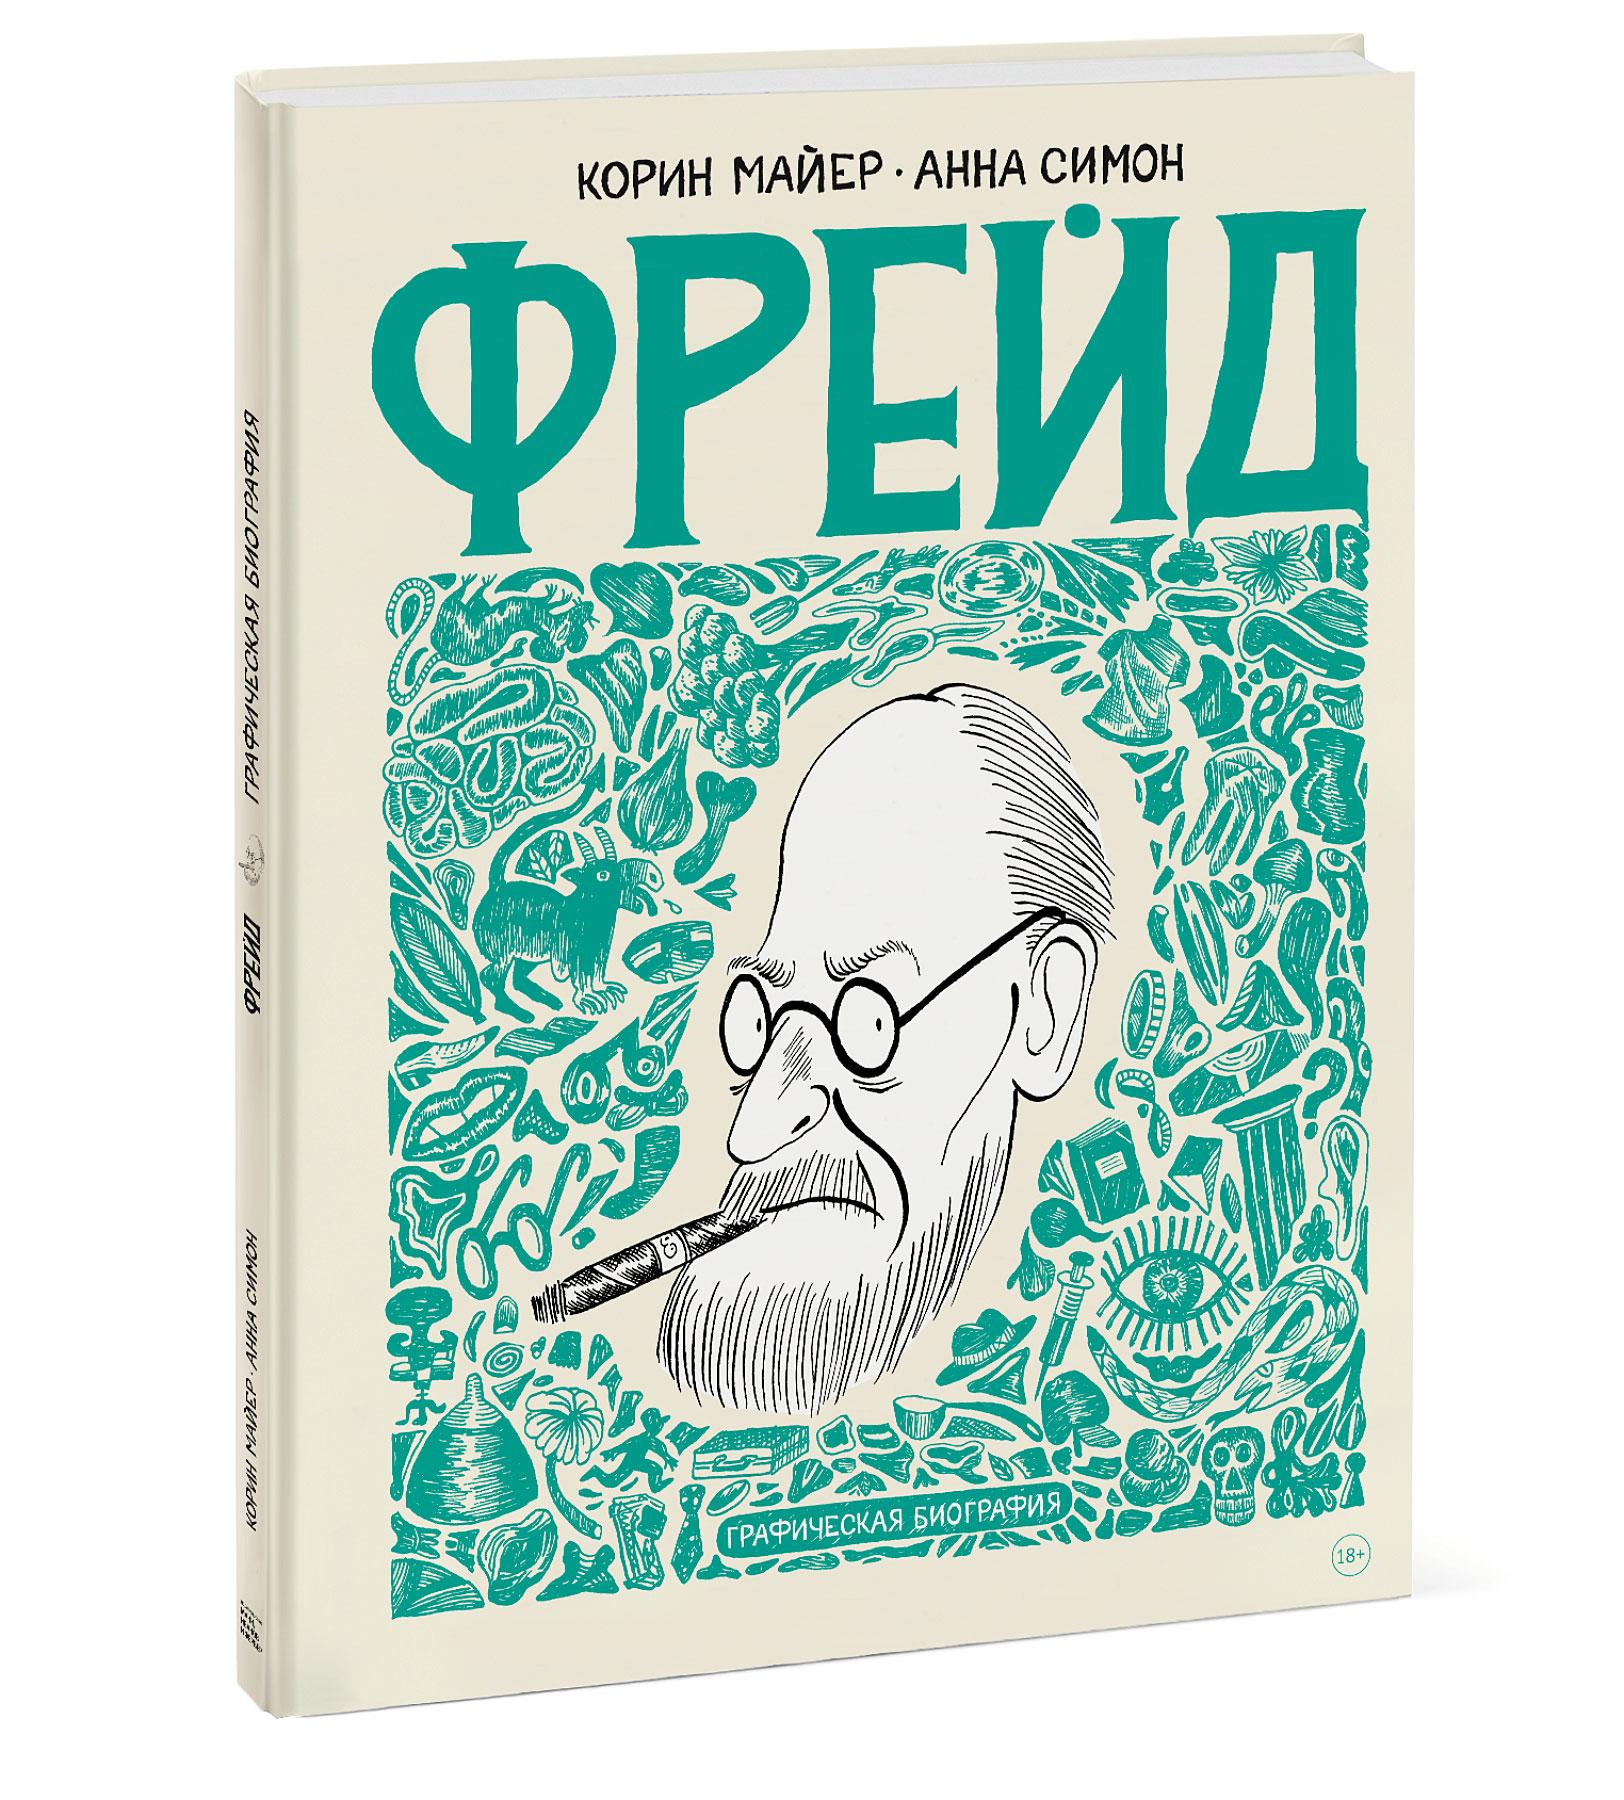 Zakazat.ru: Фрейд. Графическая биография. Корин Майер, Анна Симон